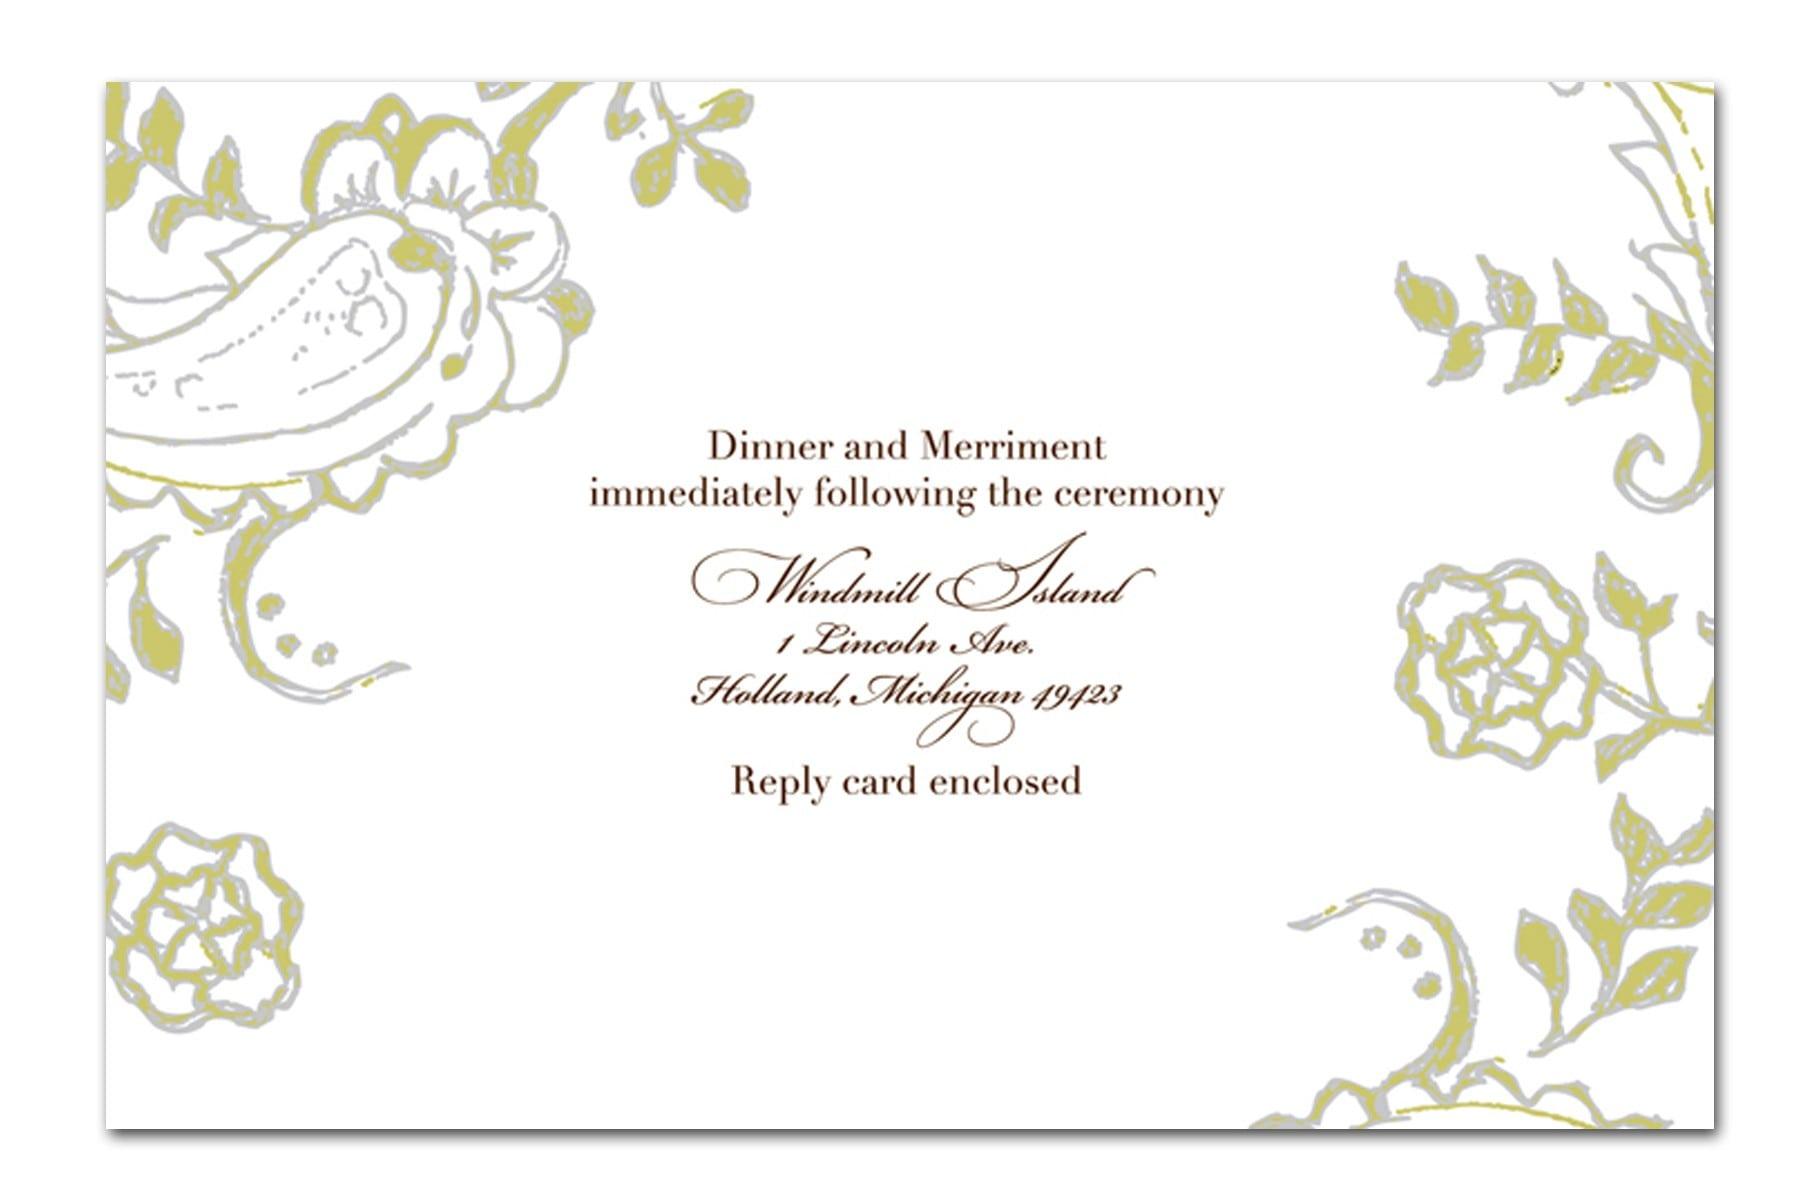 wedding_hindu_invitations_free_templates-5.jpeg